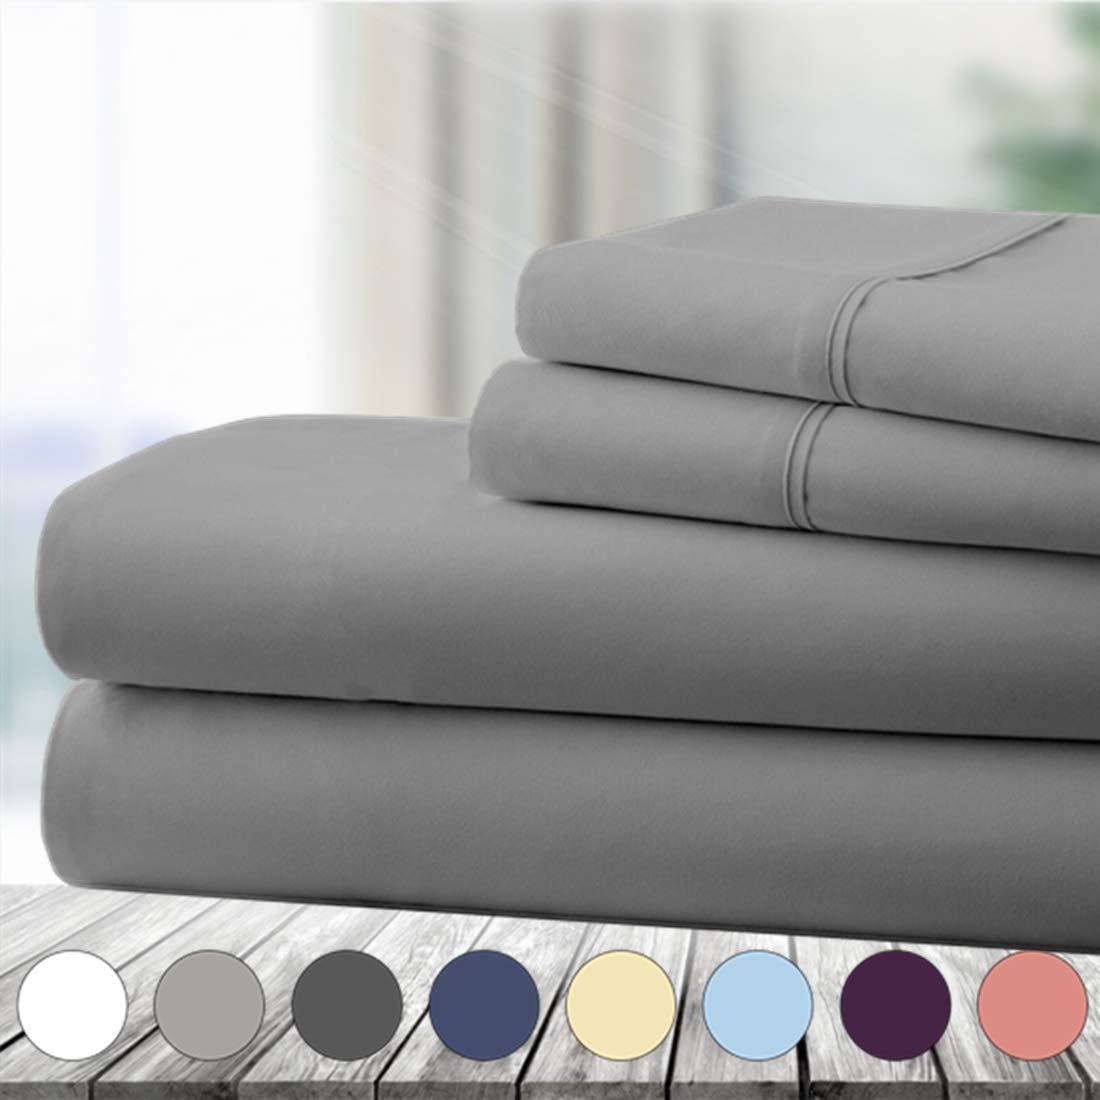 Abakan King Bed Sheet Set 4 Piece Super Soft Brushed Microfiber 1800 Thread Count Hotel Luxury Egyptian Sheet Breathable, Wrinkle, Fade Resistant Deep Pocket Bedding Sheet Set (King, Grey)